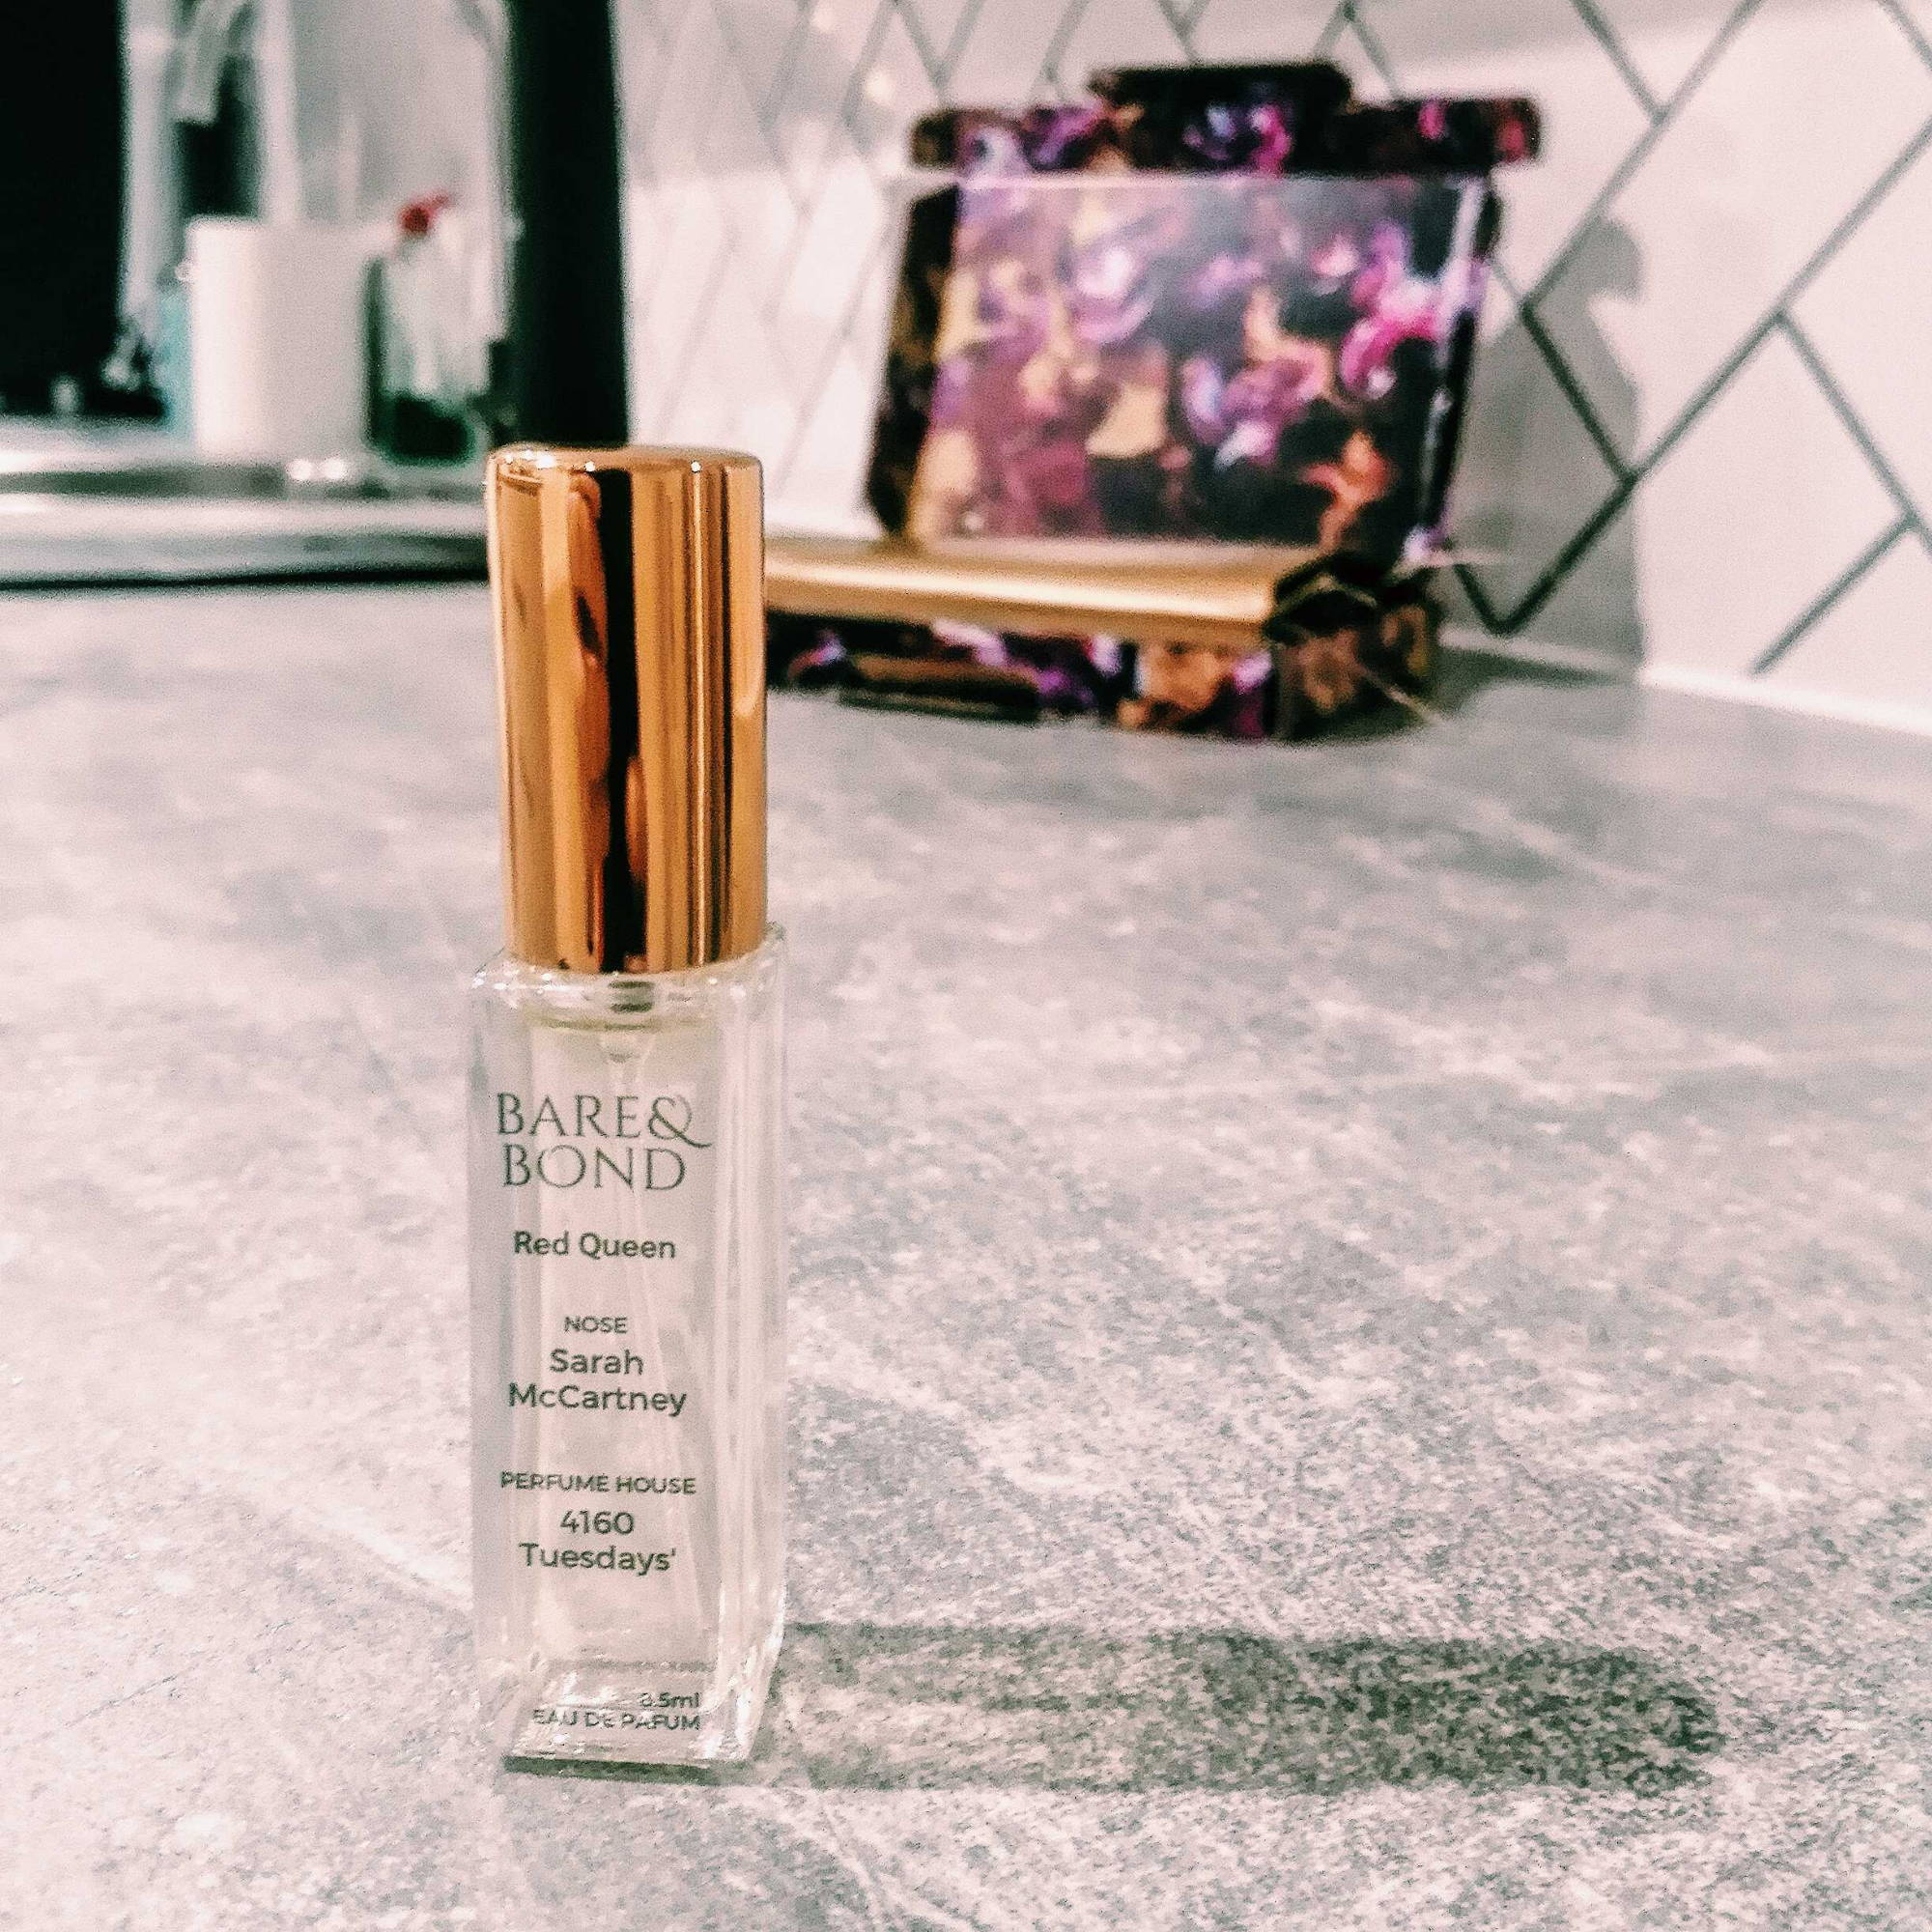 Bare & Bond perfume subscription